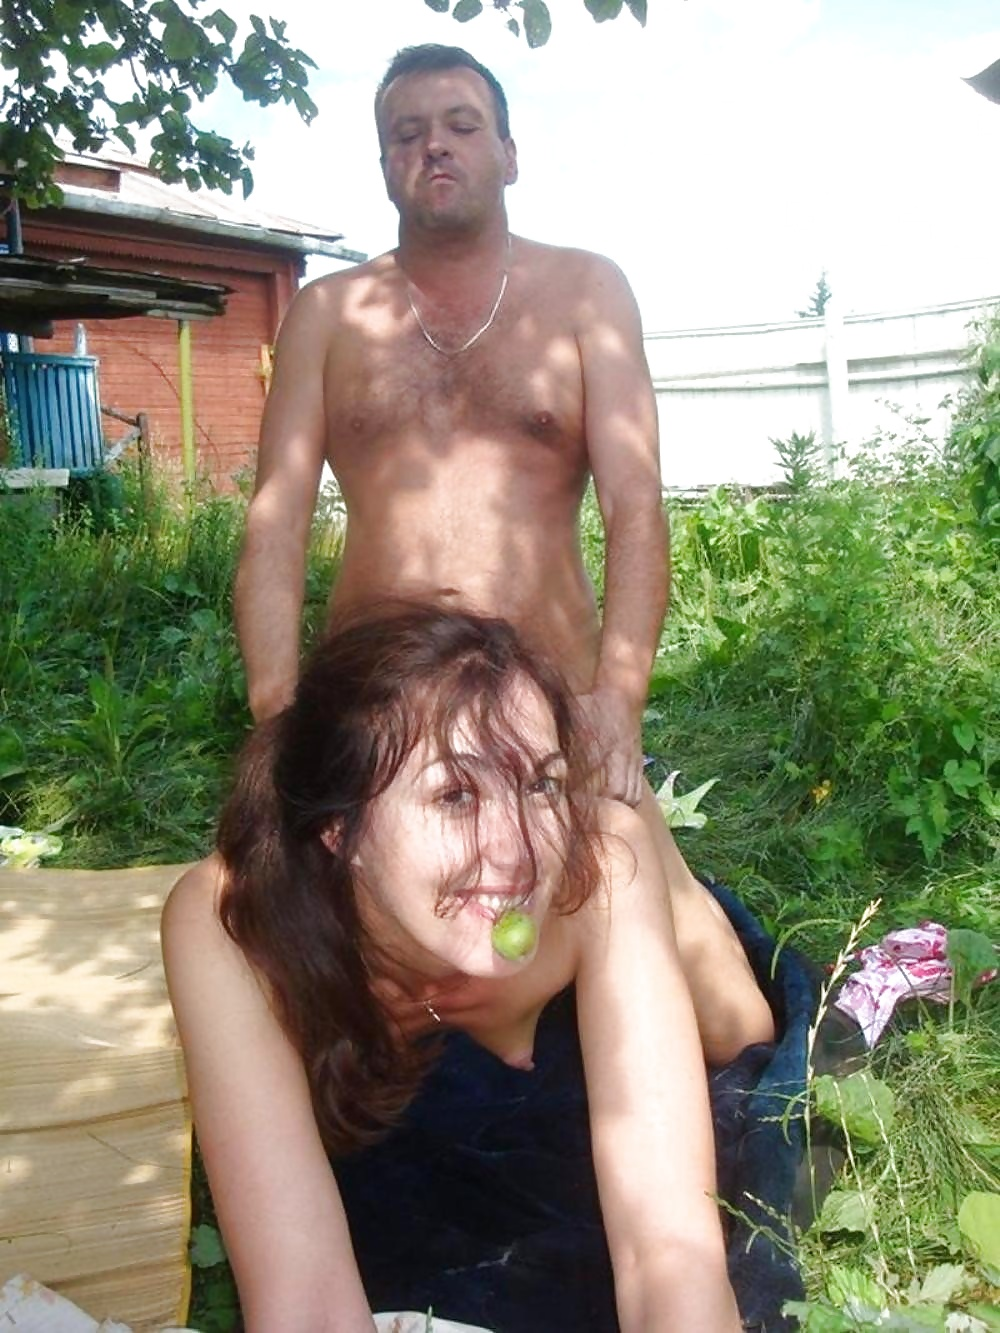 геев пока секс на даче женой тоже можно